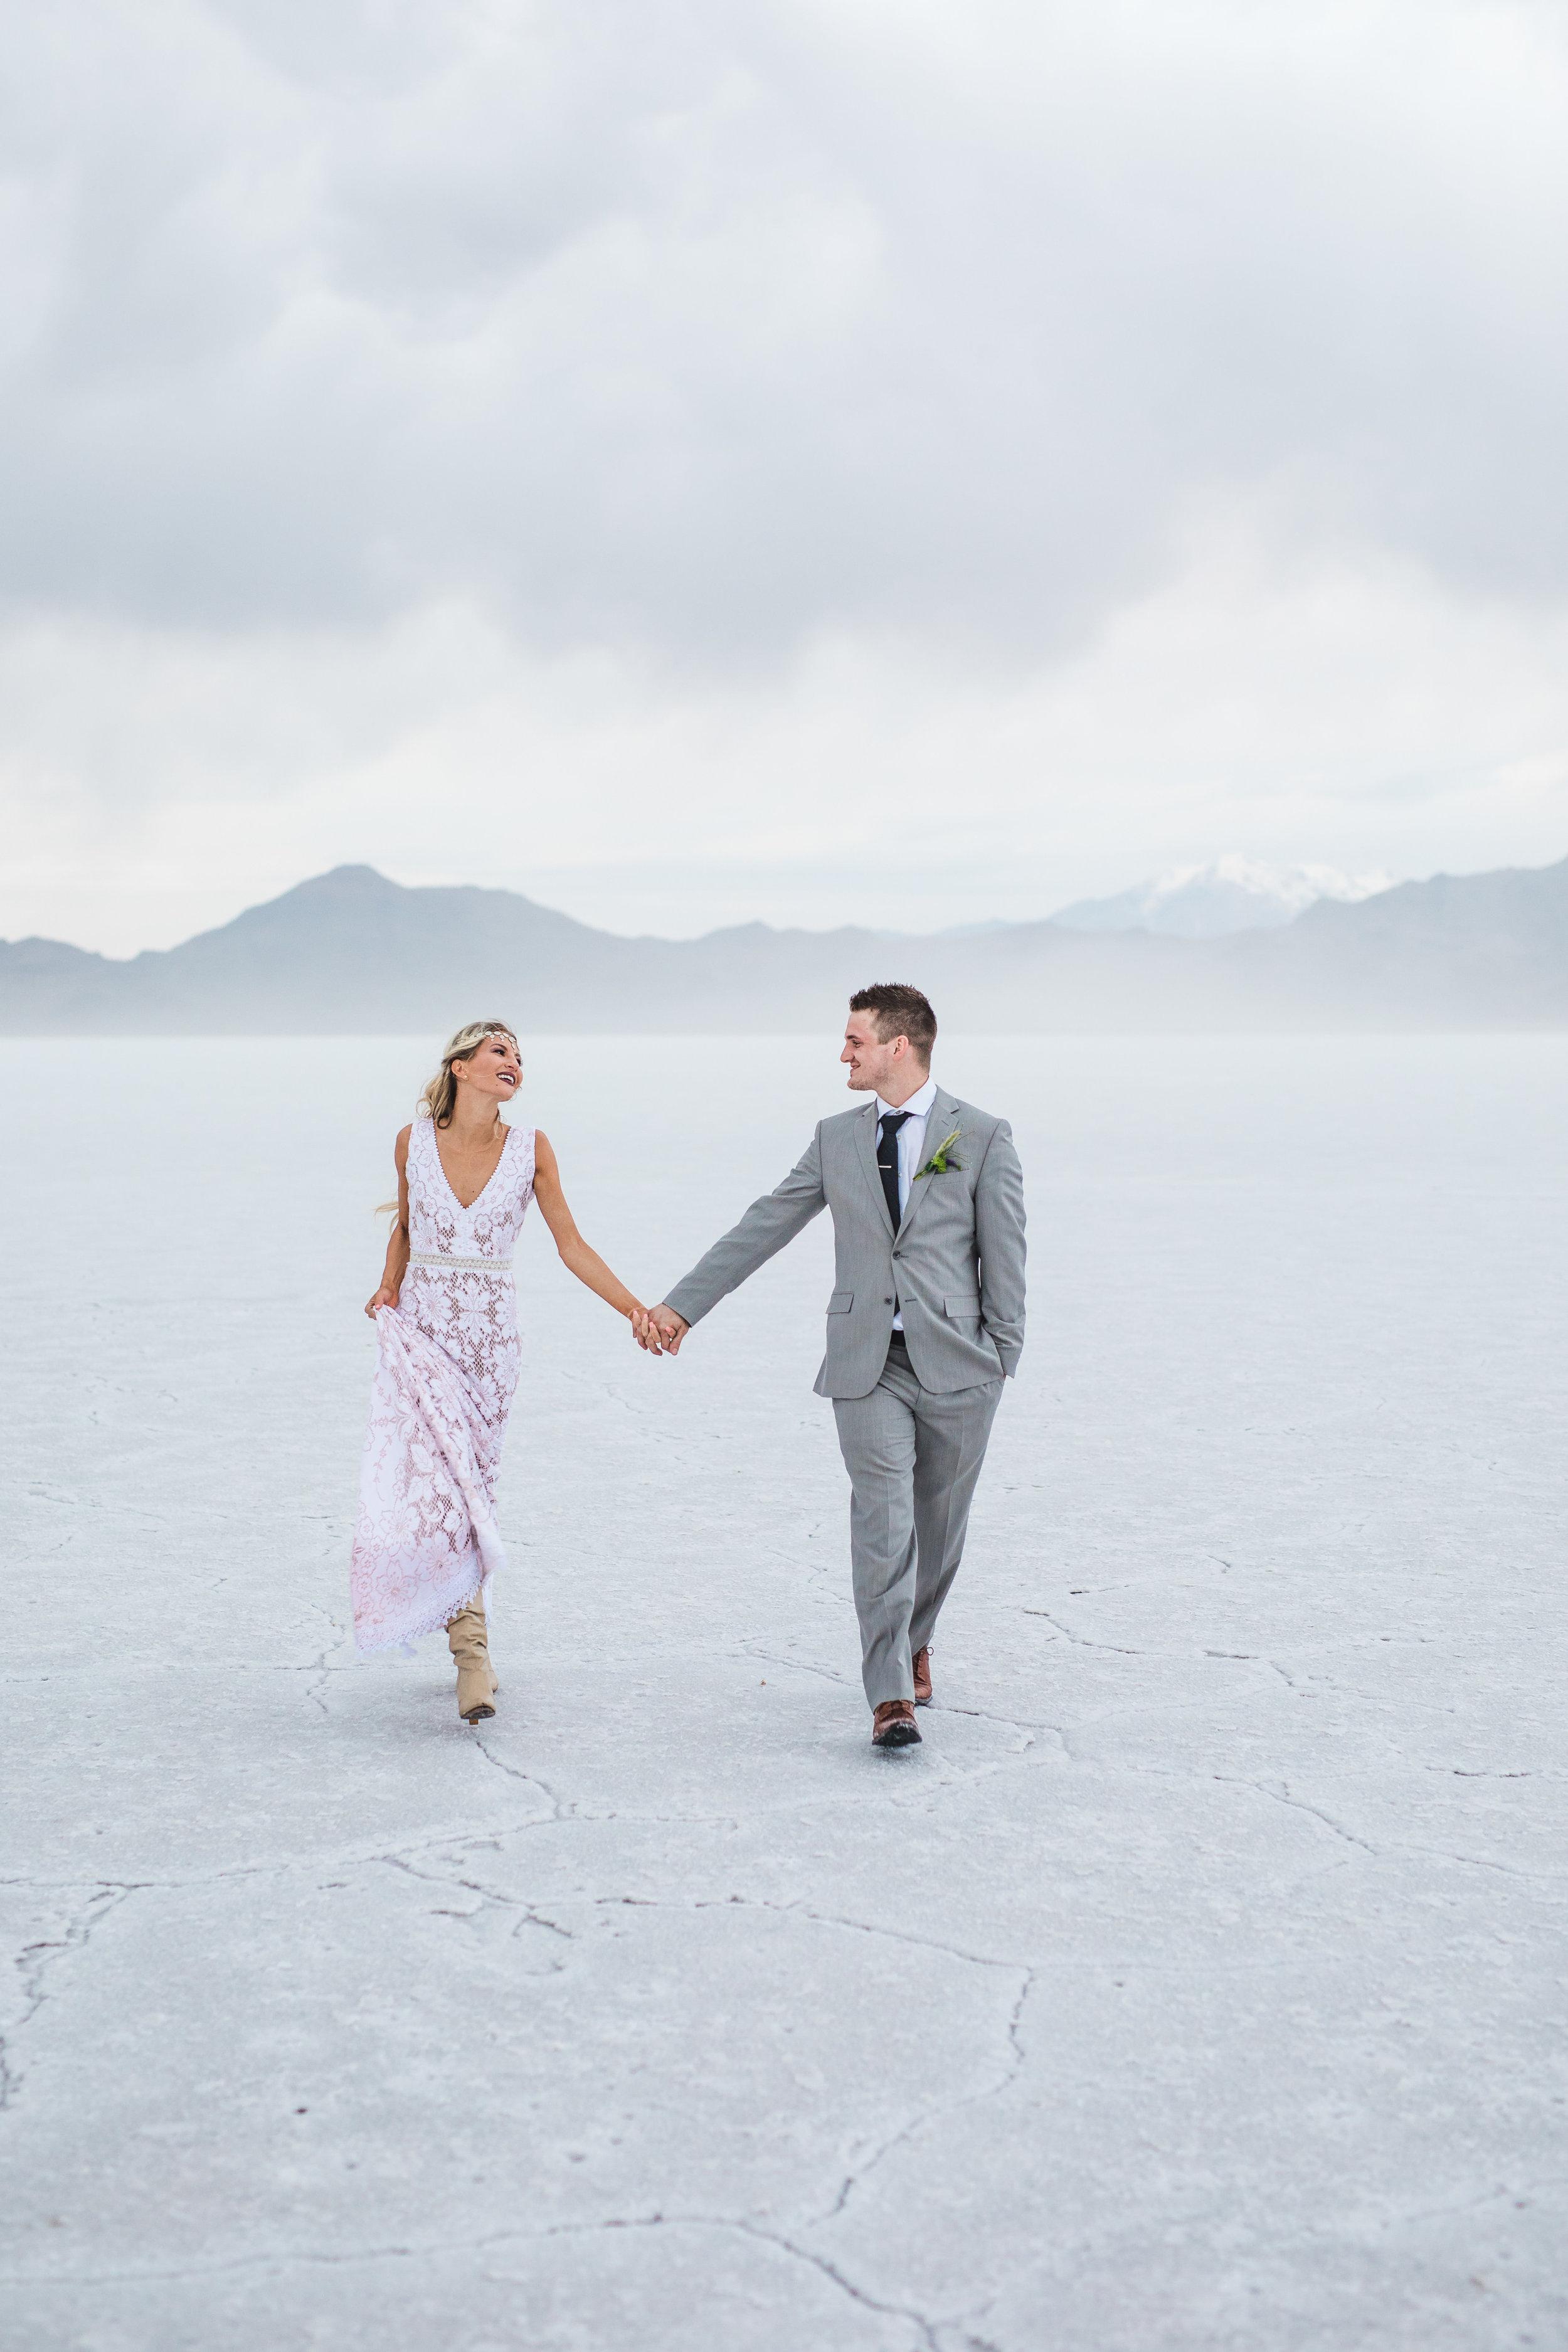 Kyle Loves Tori Utah Traveling Fine art adventure wedding photography